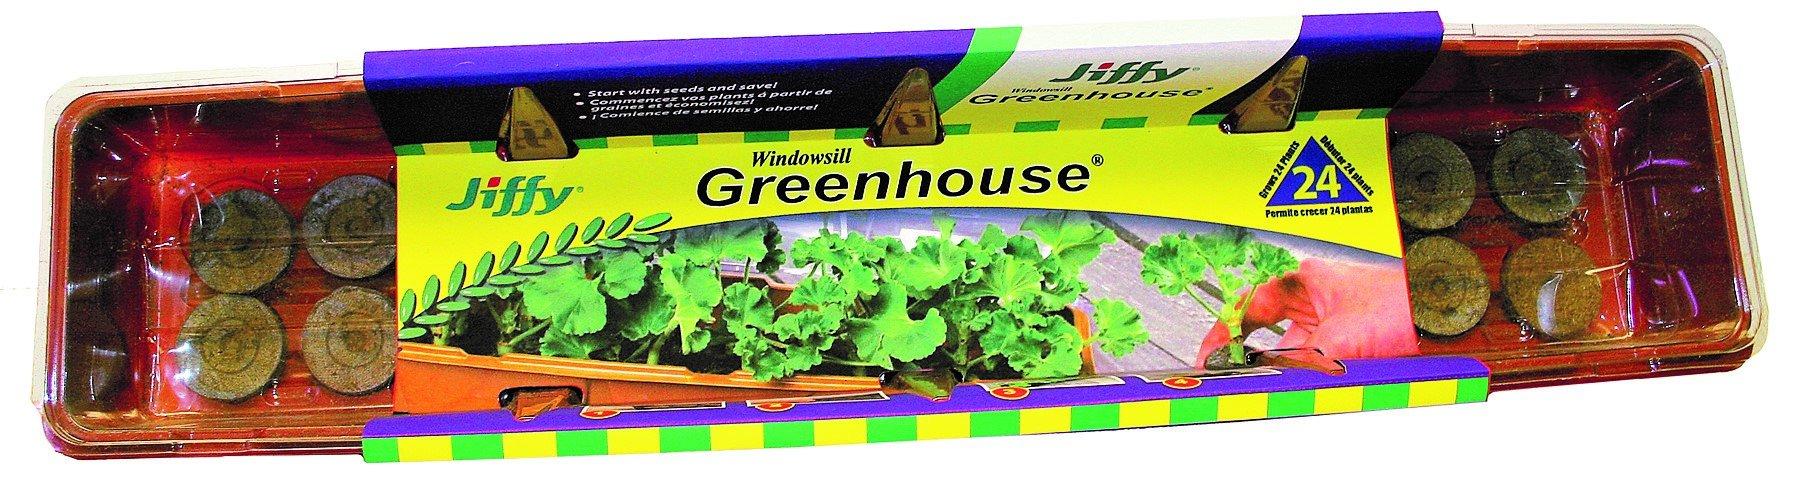 Jiffy 36mm Windowsill Greenhouse 24-Plant Starter Kit